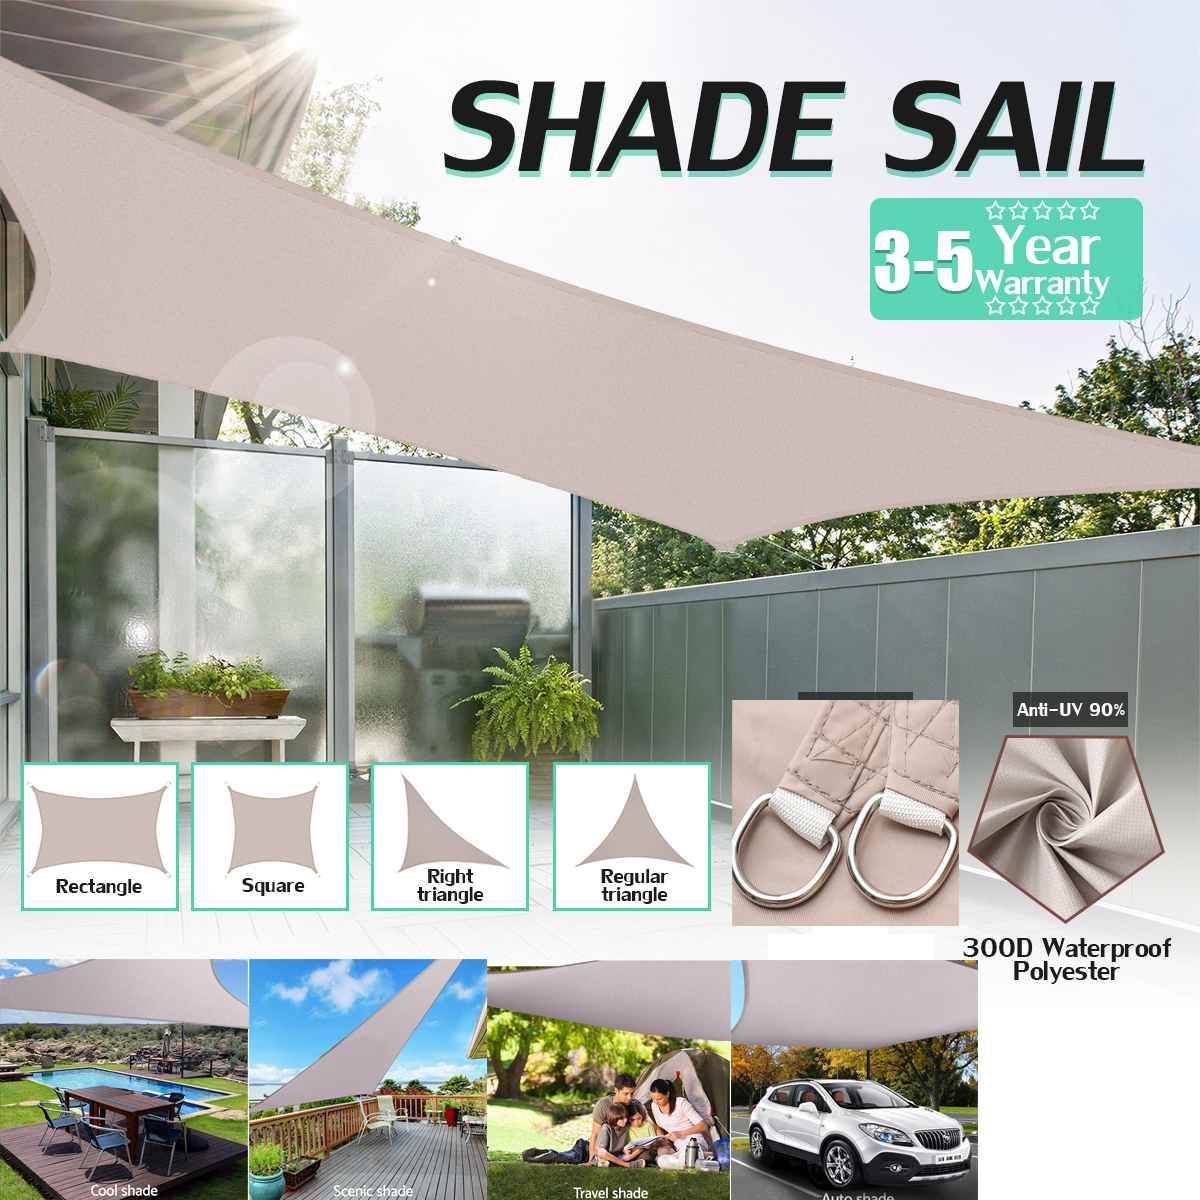 High Quality Sun Sail Shade Patio Awning Canopy Sunscreen 6x4.2x4.2m Dark Grey